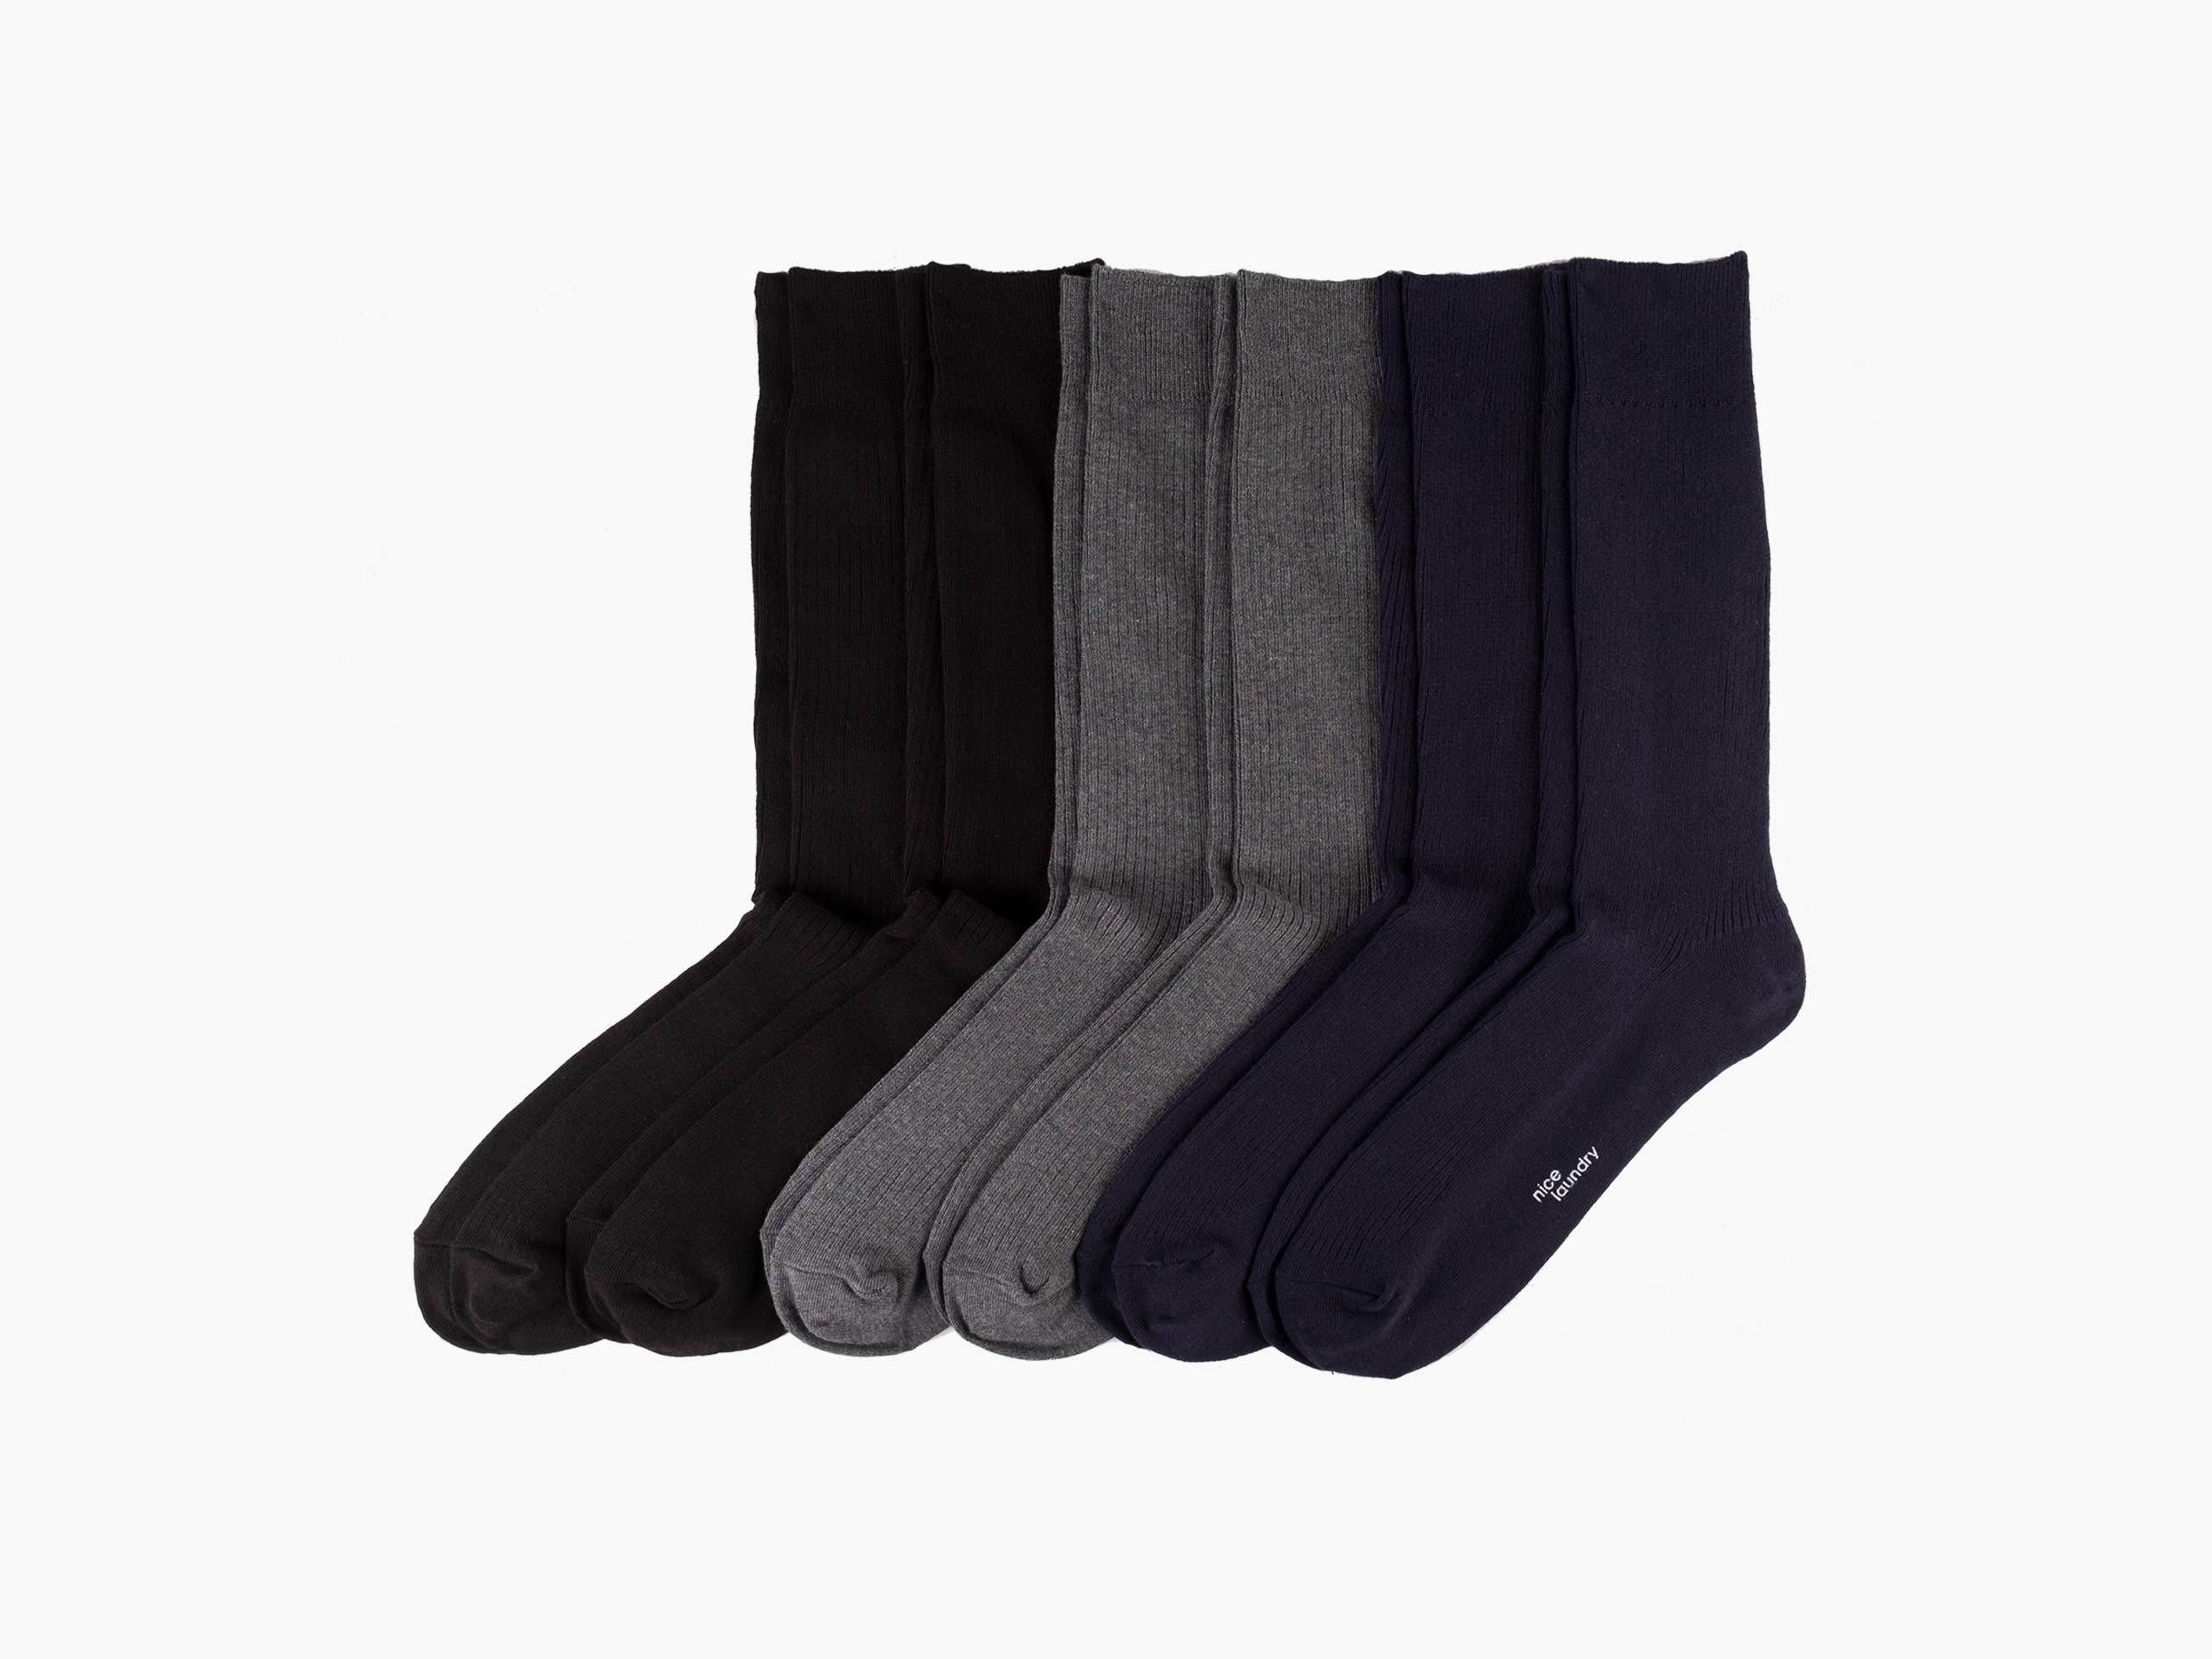 True Ribbed Dress Socks Nice Laundry Nice Laundry Lounge